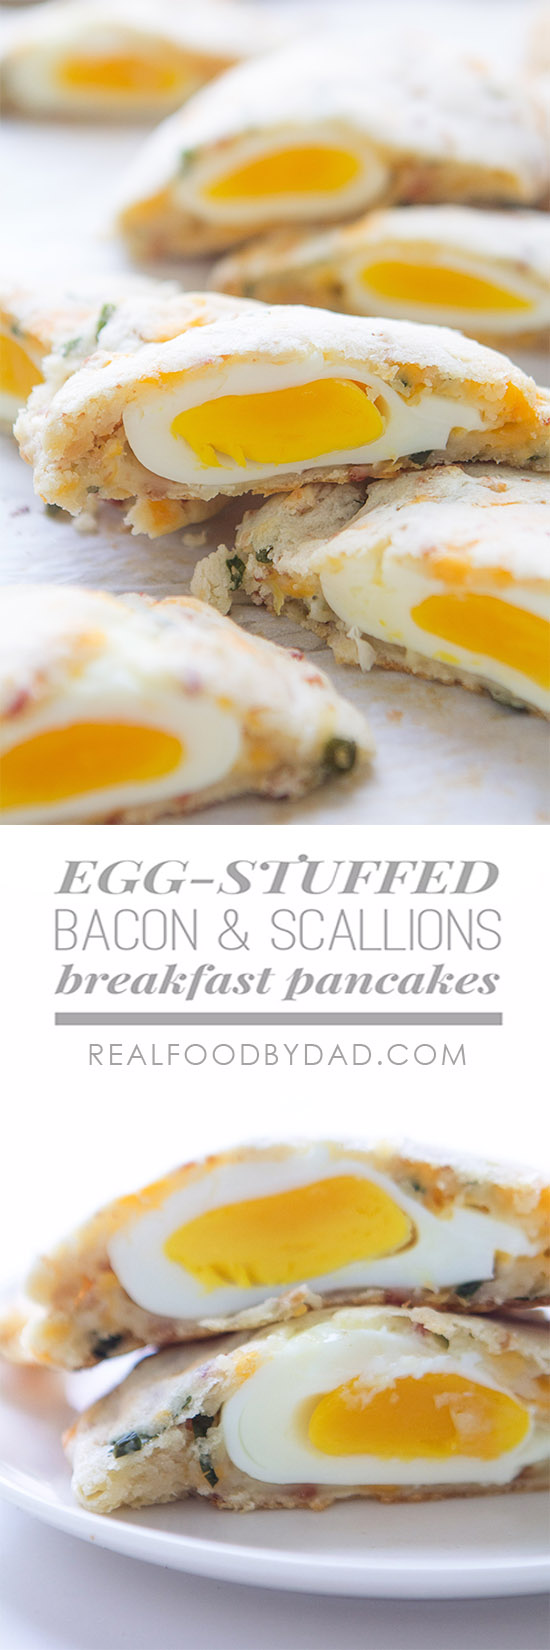 Egg Stuffed Bacon & Scallion Breakfast Pancakes